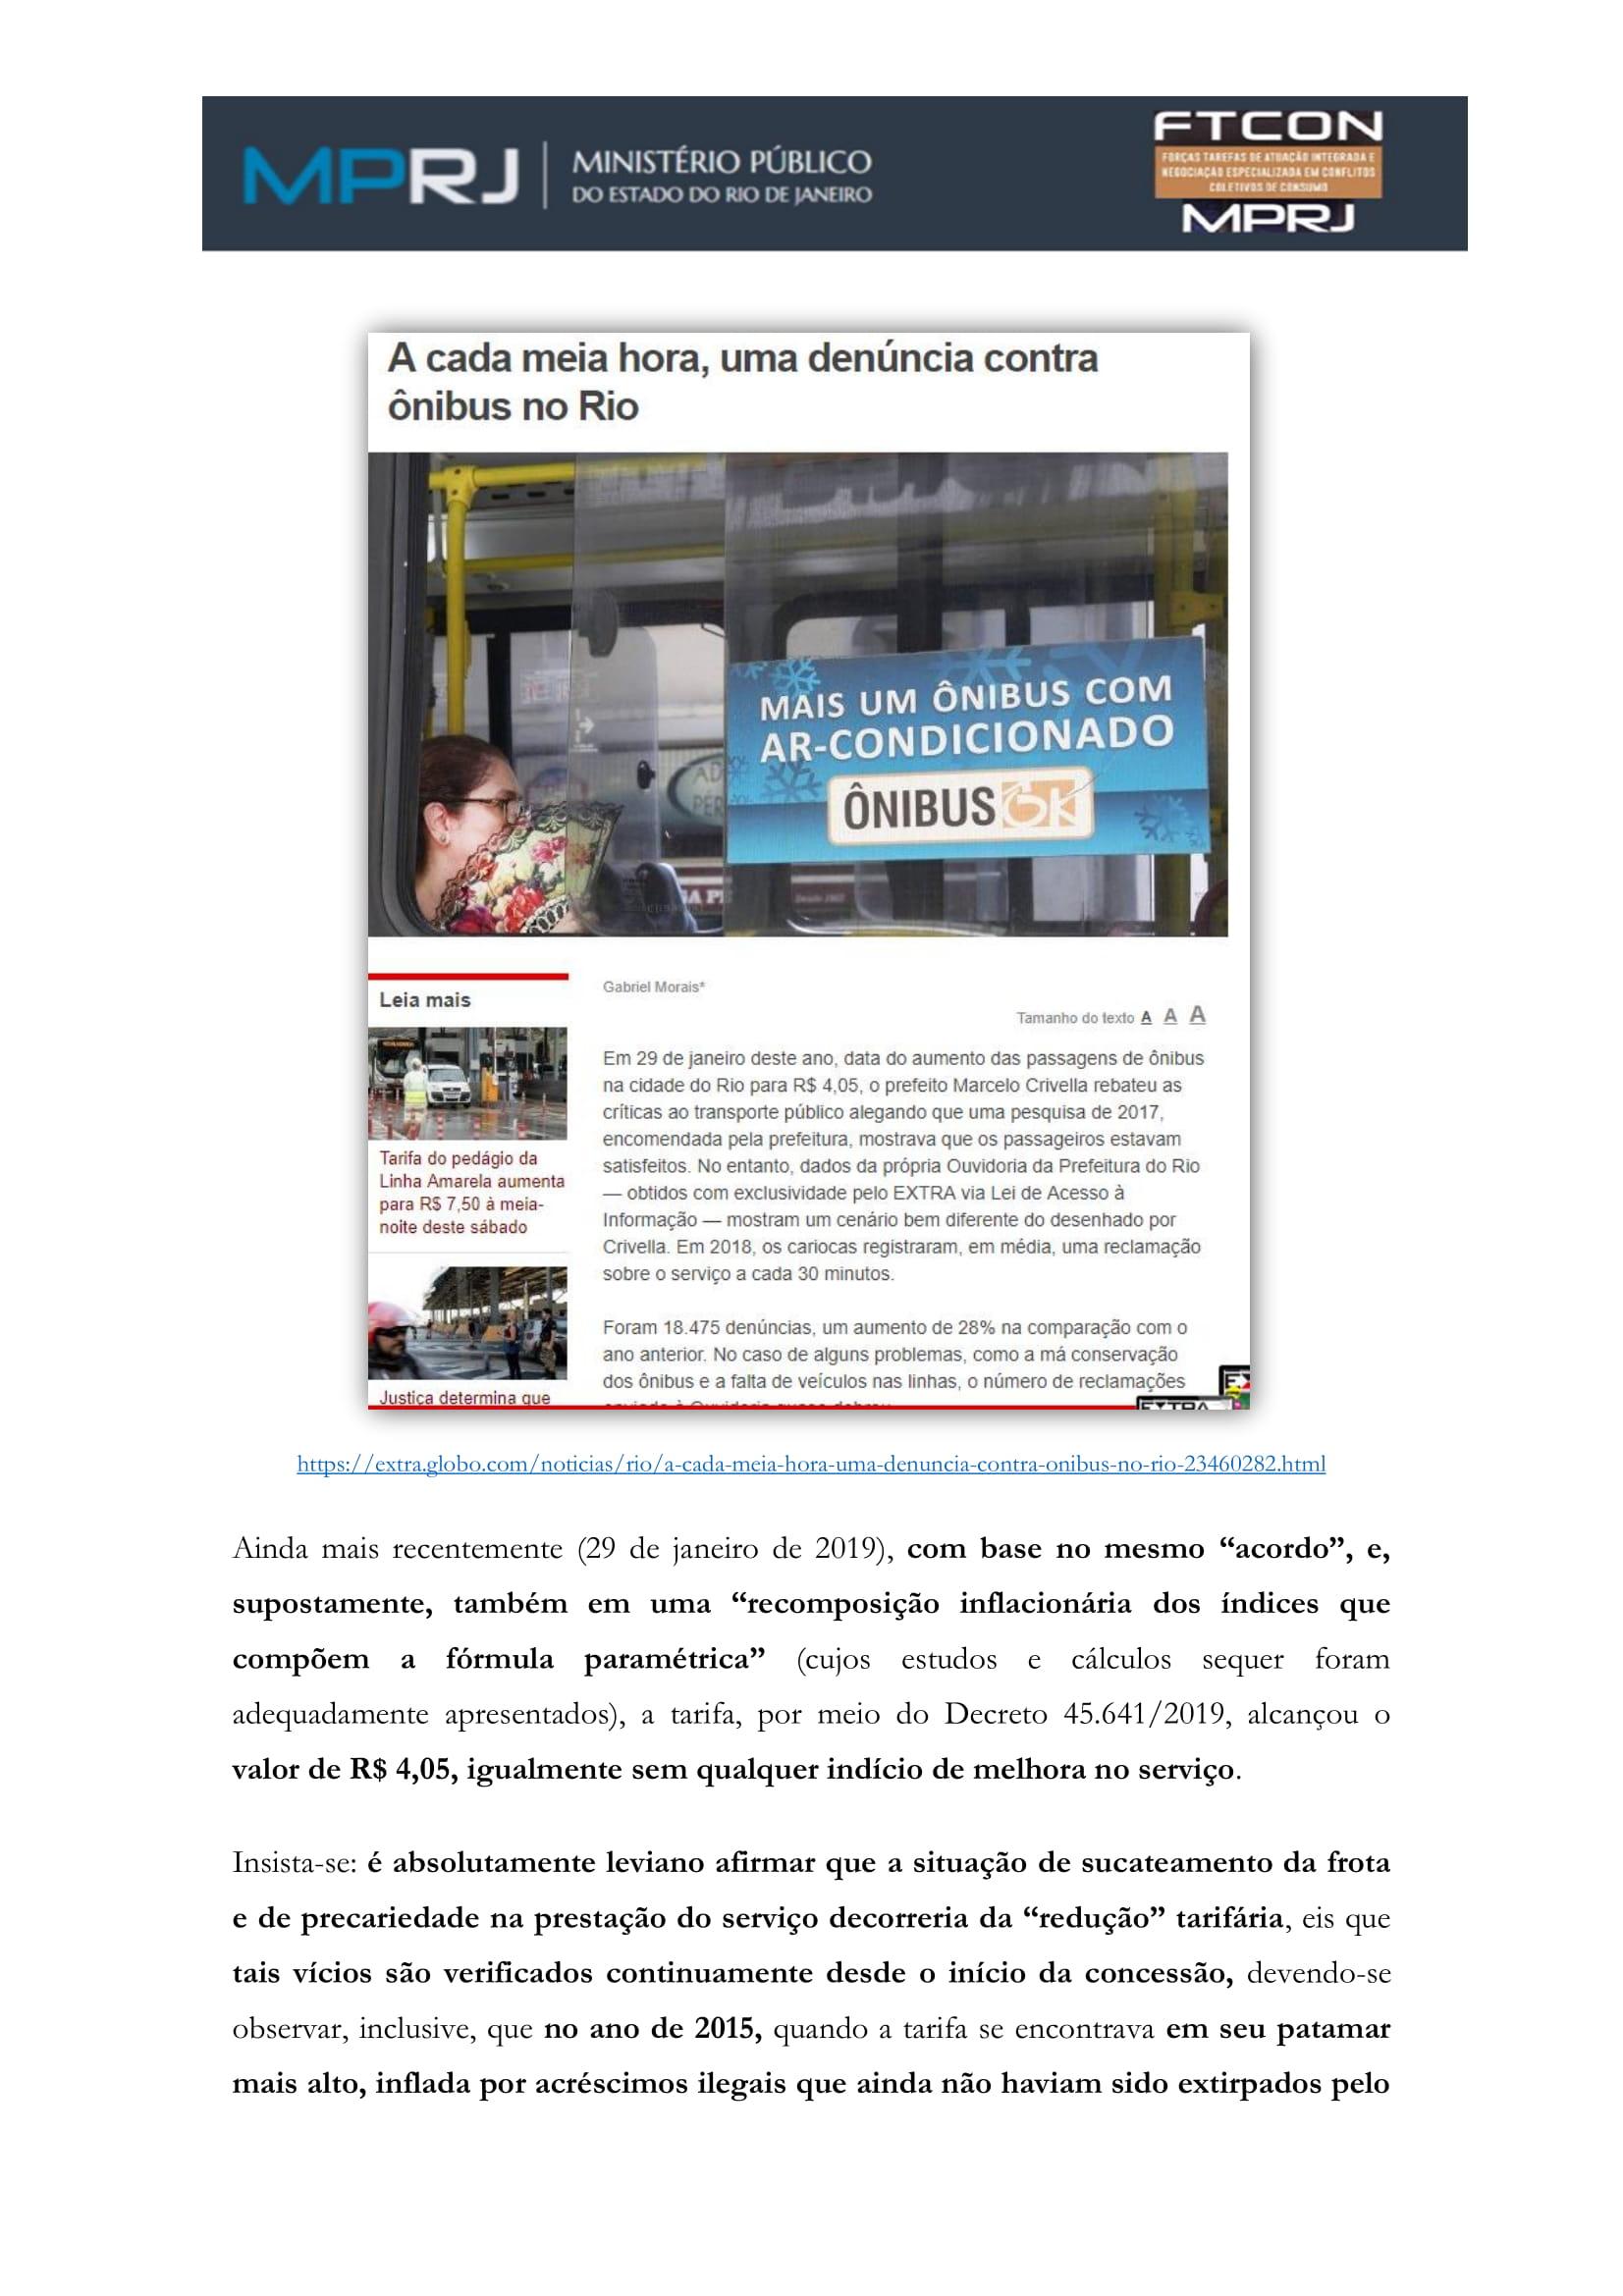 acp_caducidade_onibus_dr_rt-036